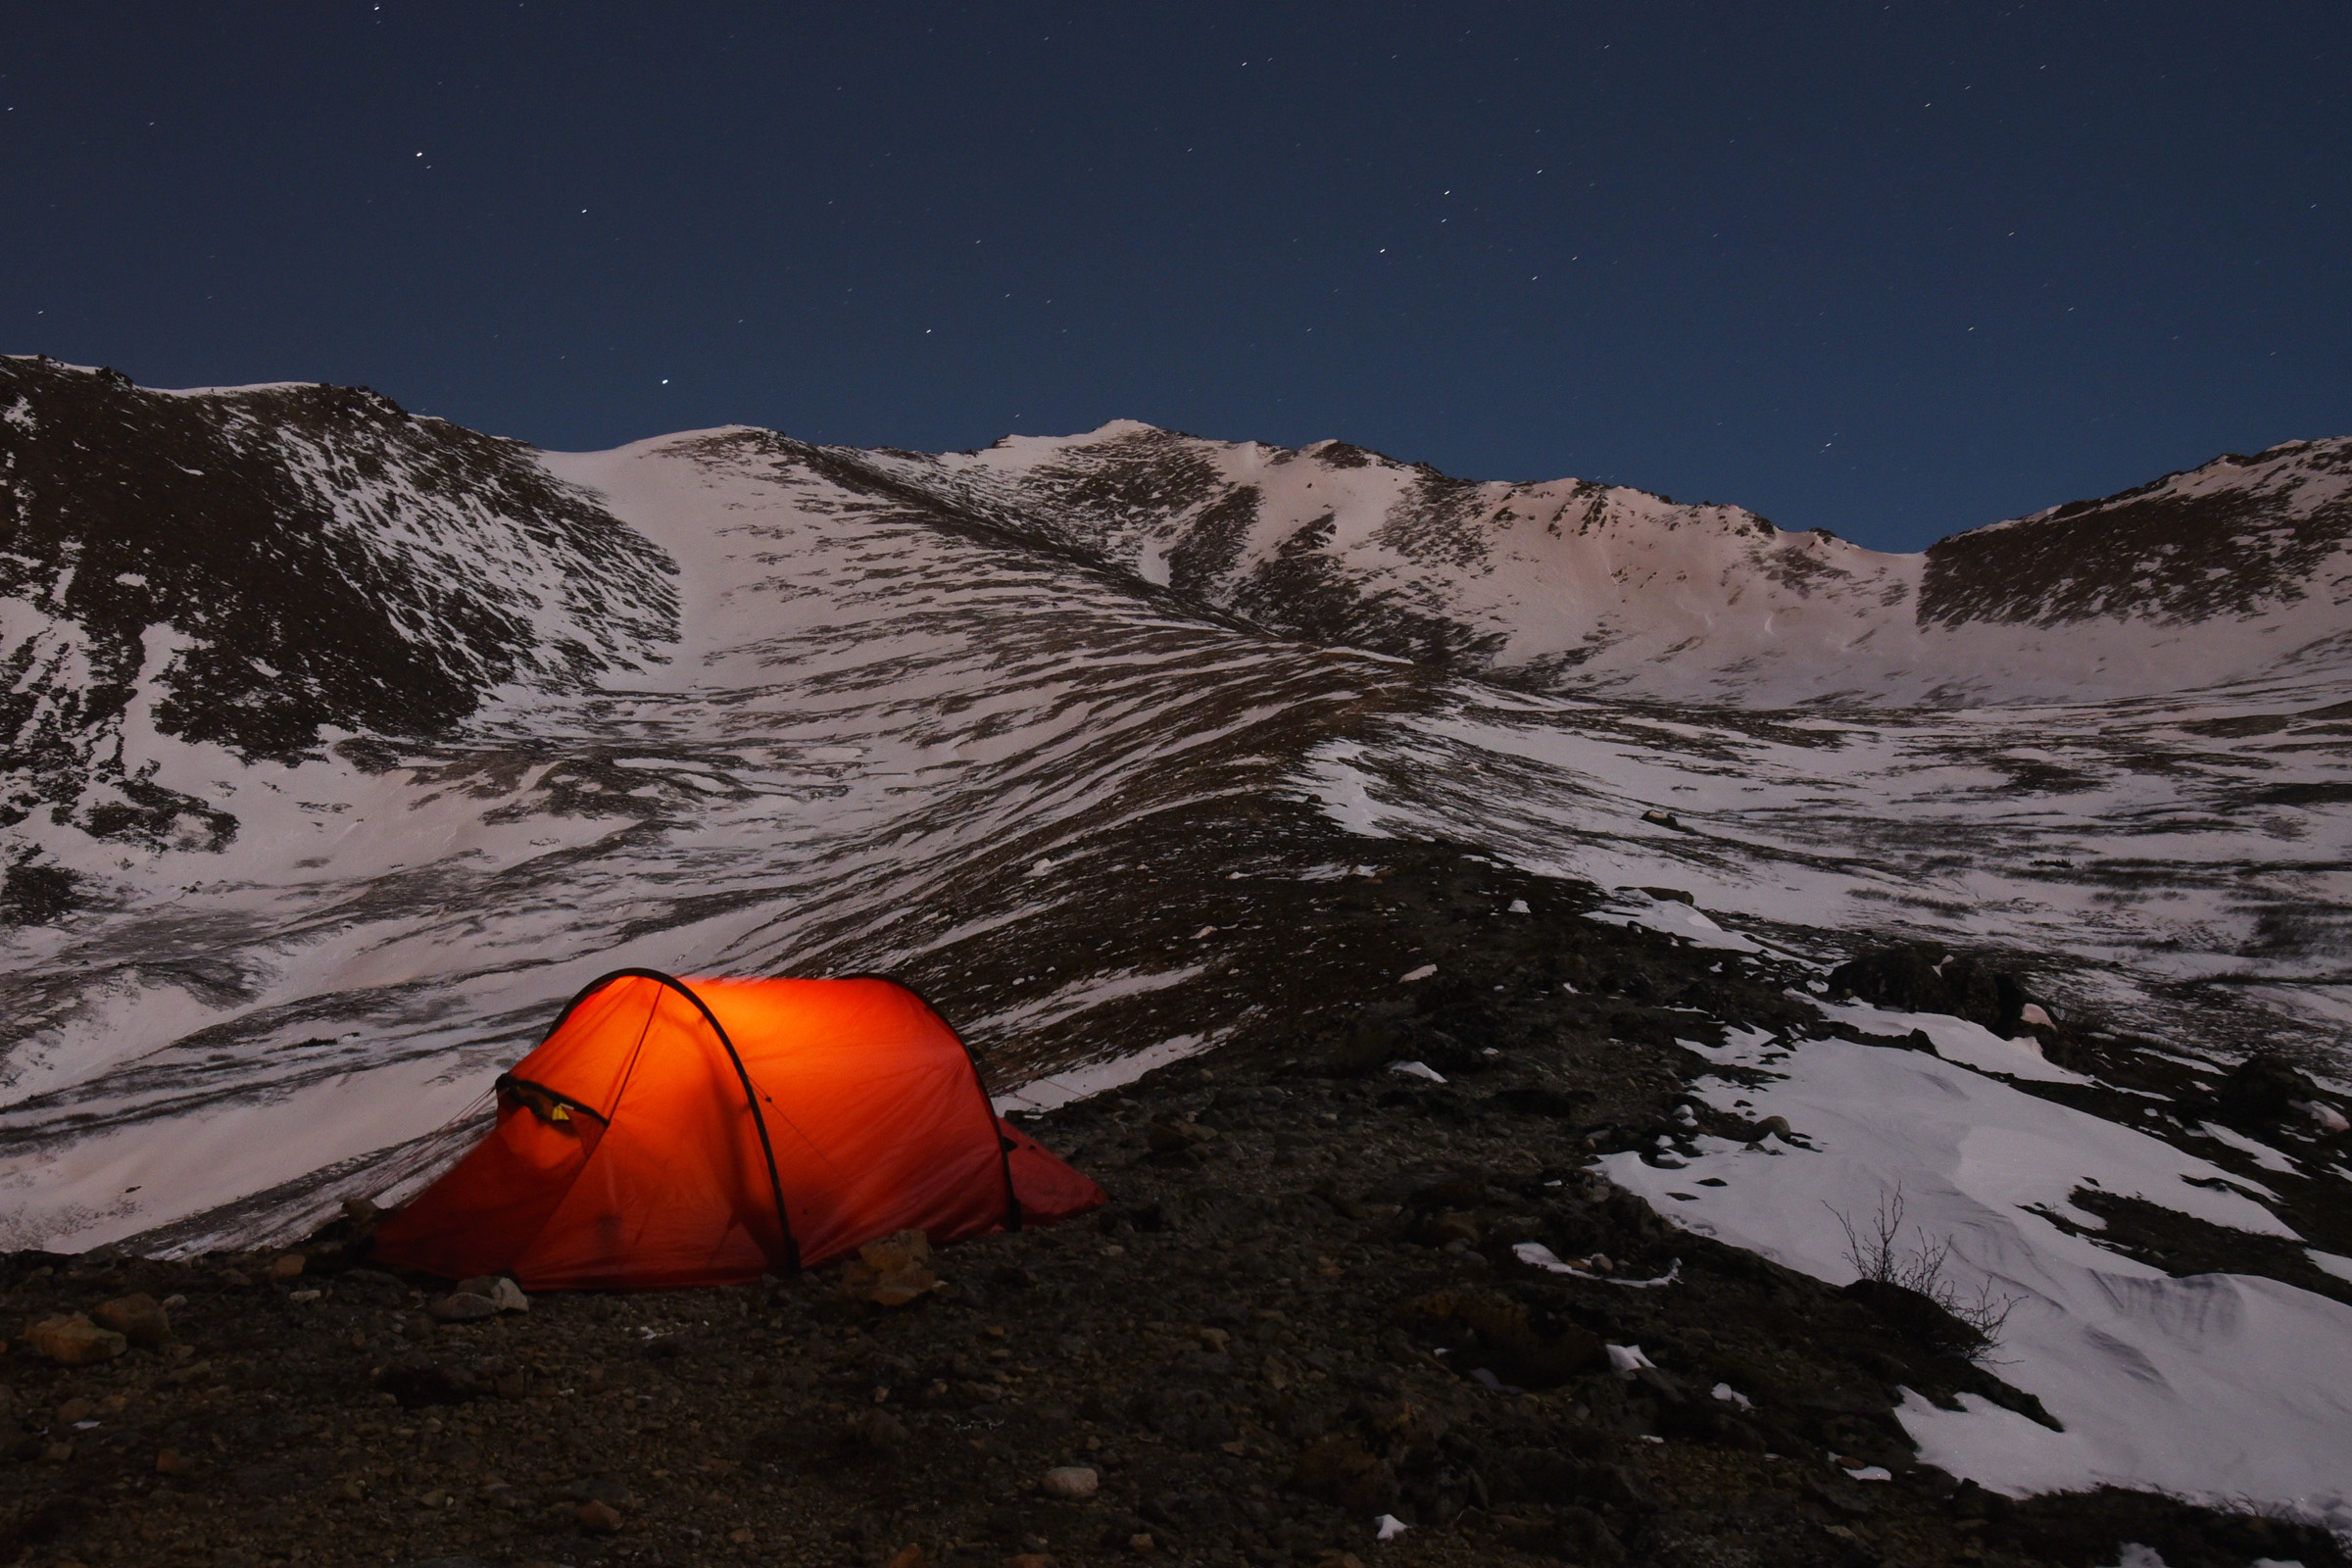 Hilleberg Nammatj 2 Tent Review Winterbear Com Product